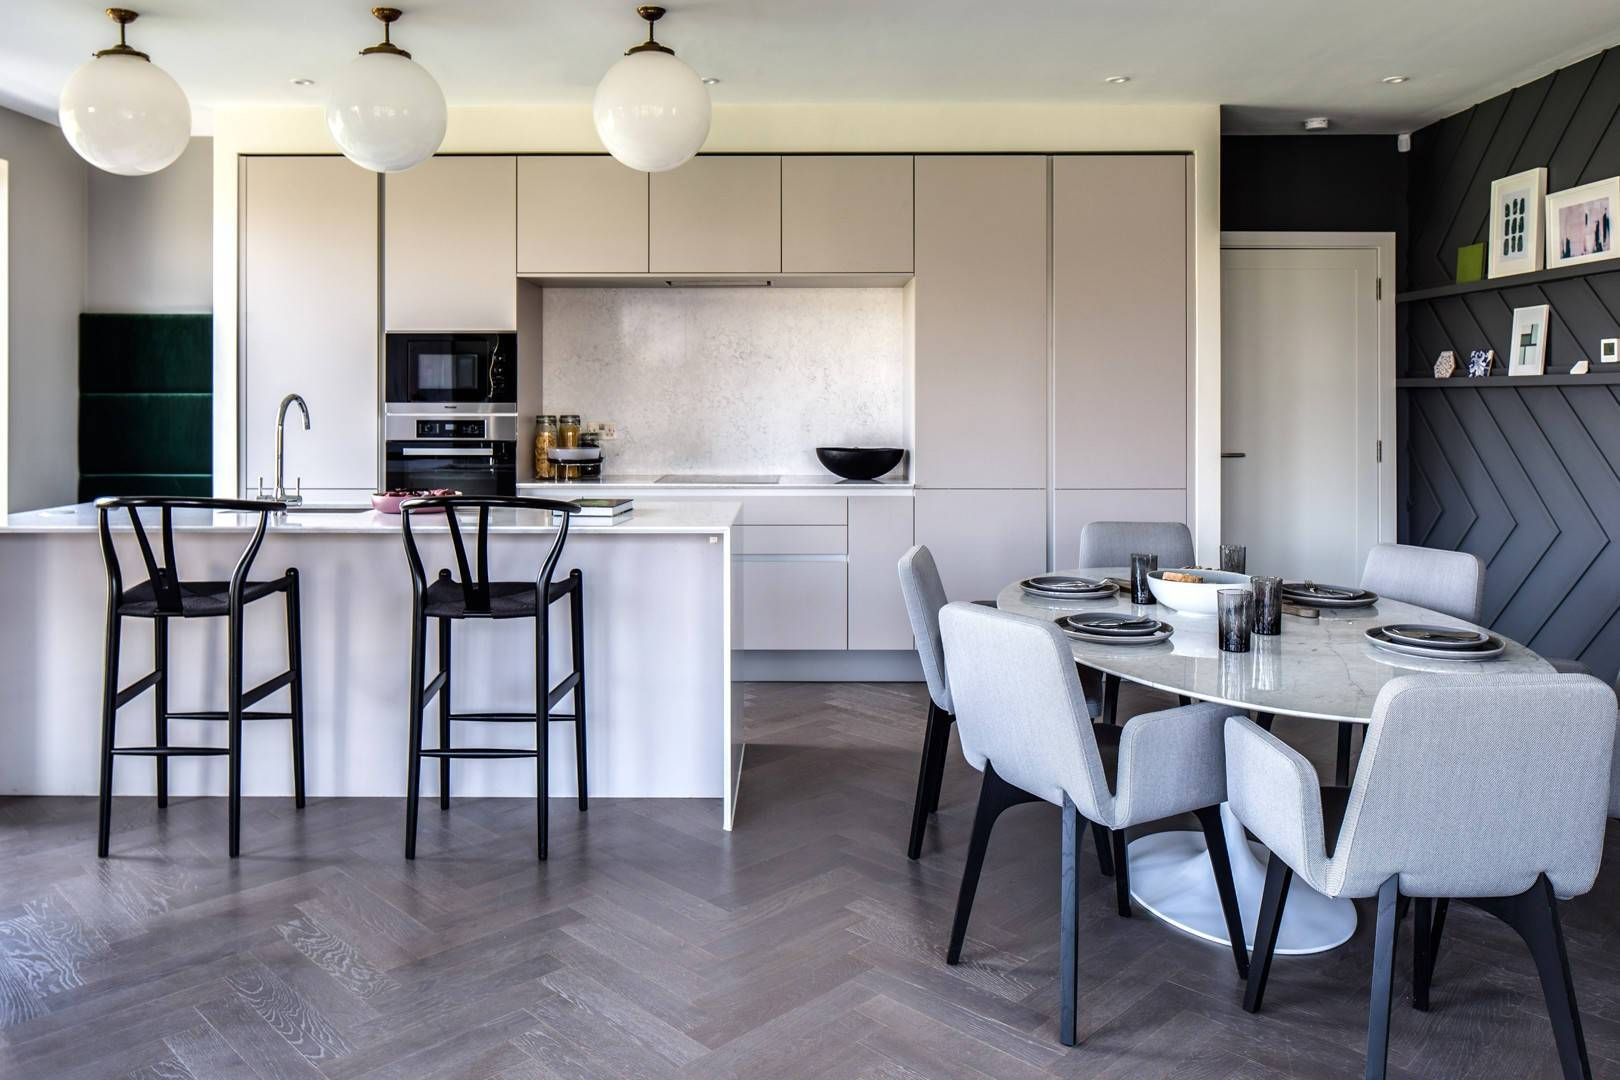 How to Bring Herringbone into the Home